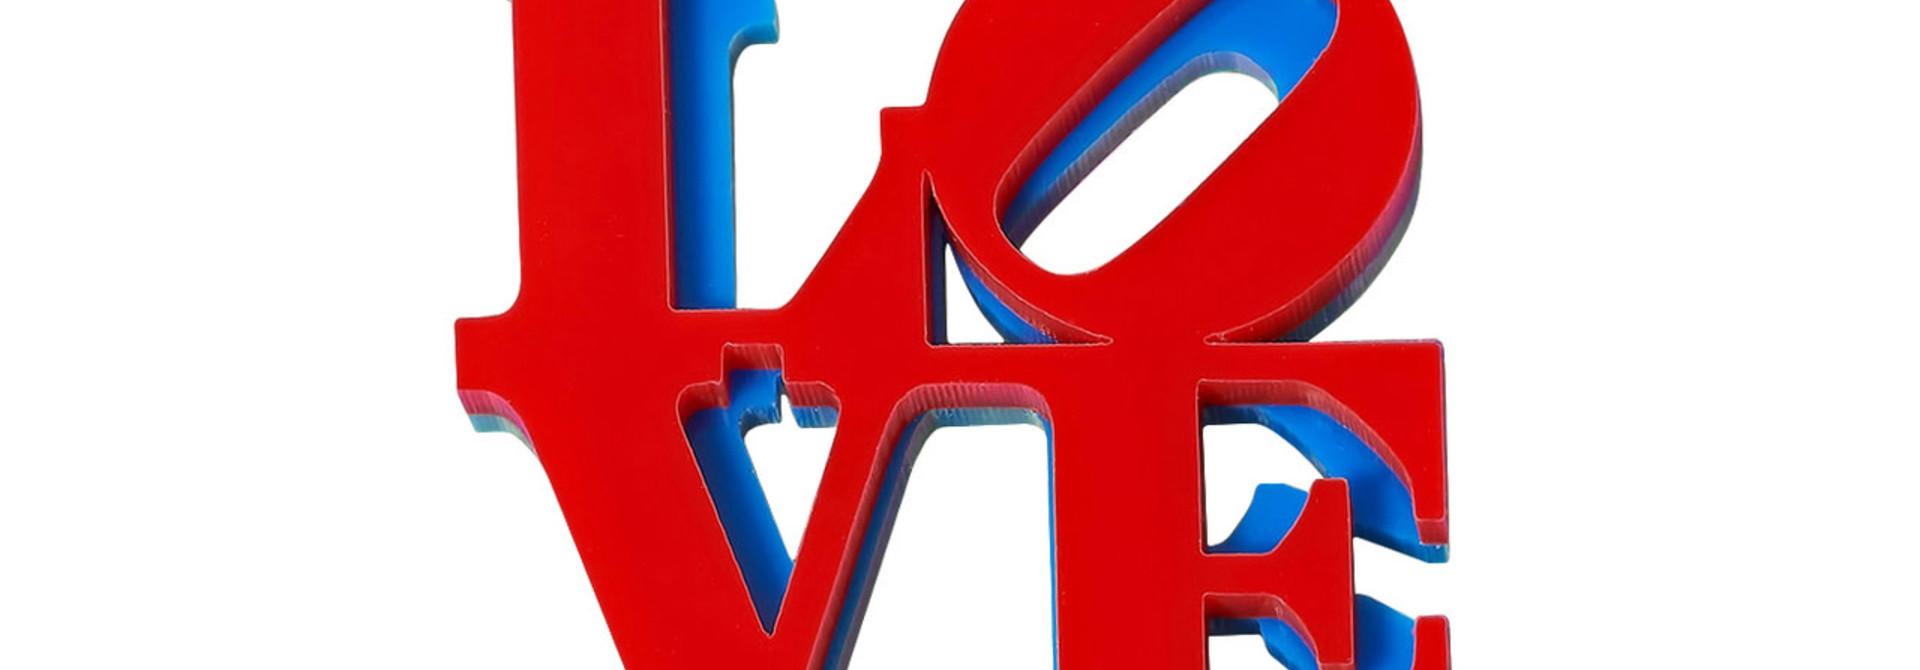 M24 LOVE PIN